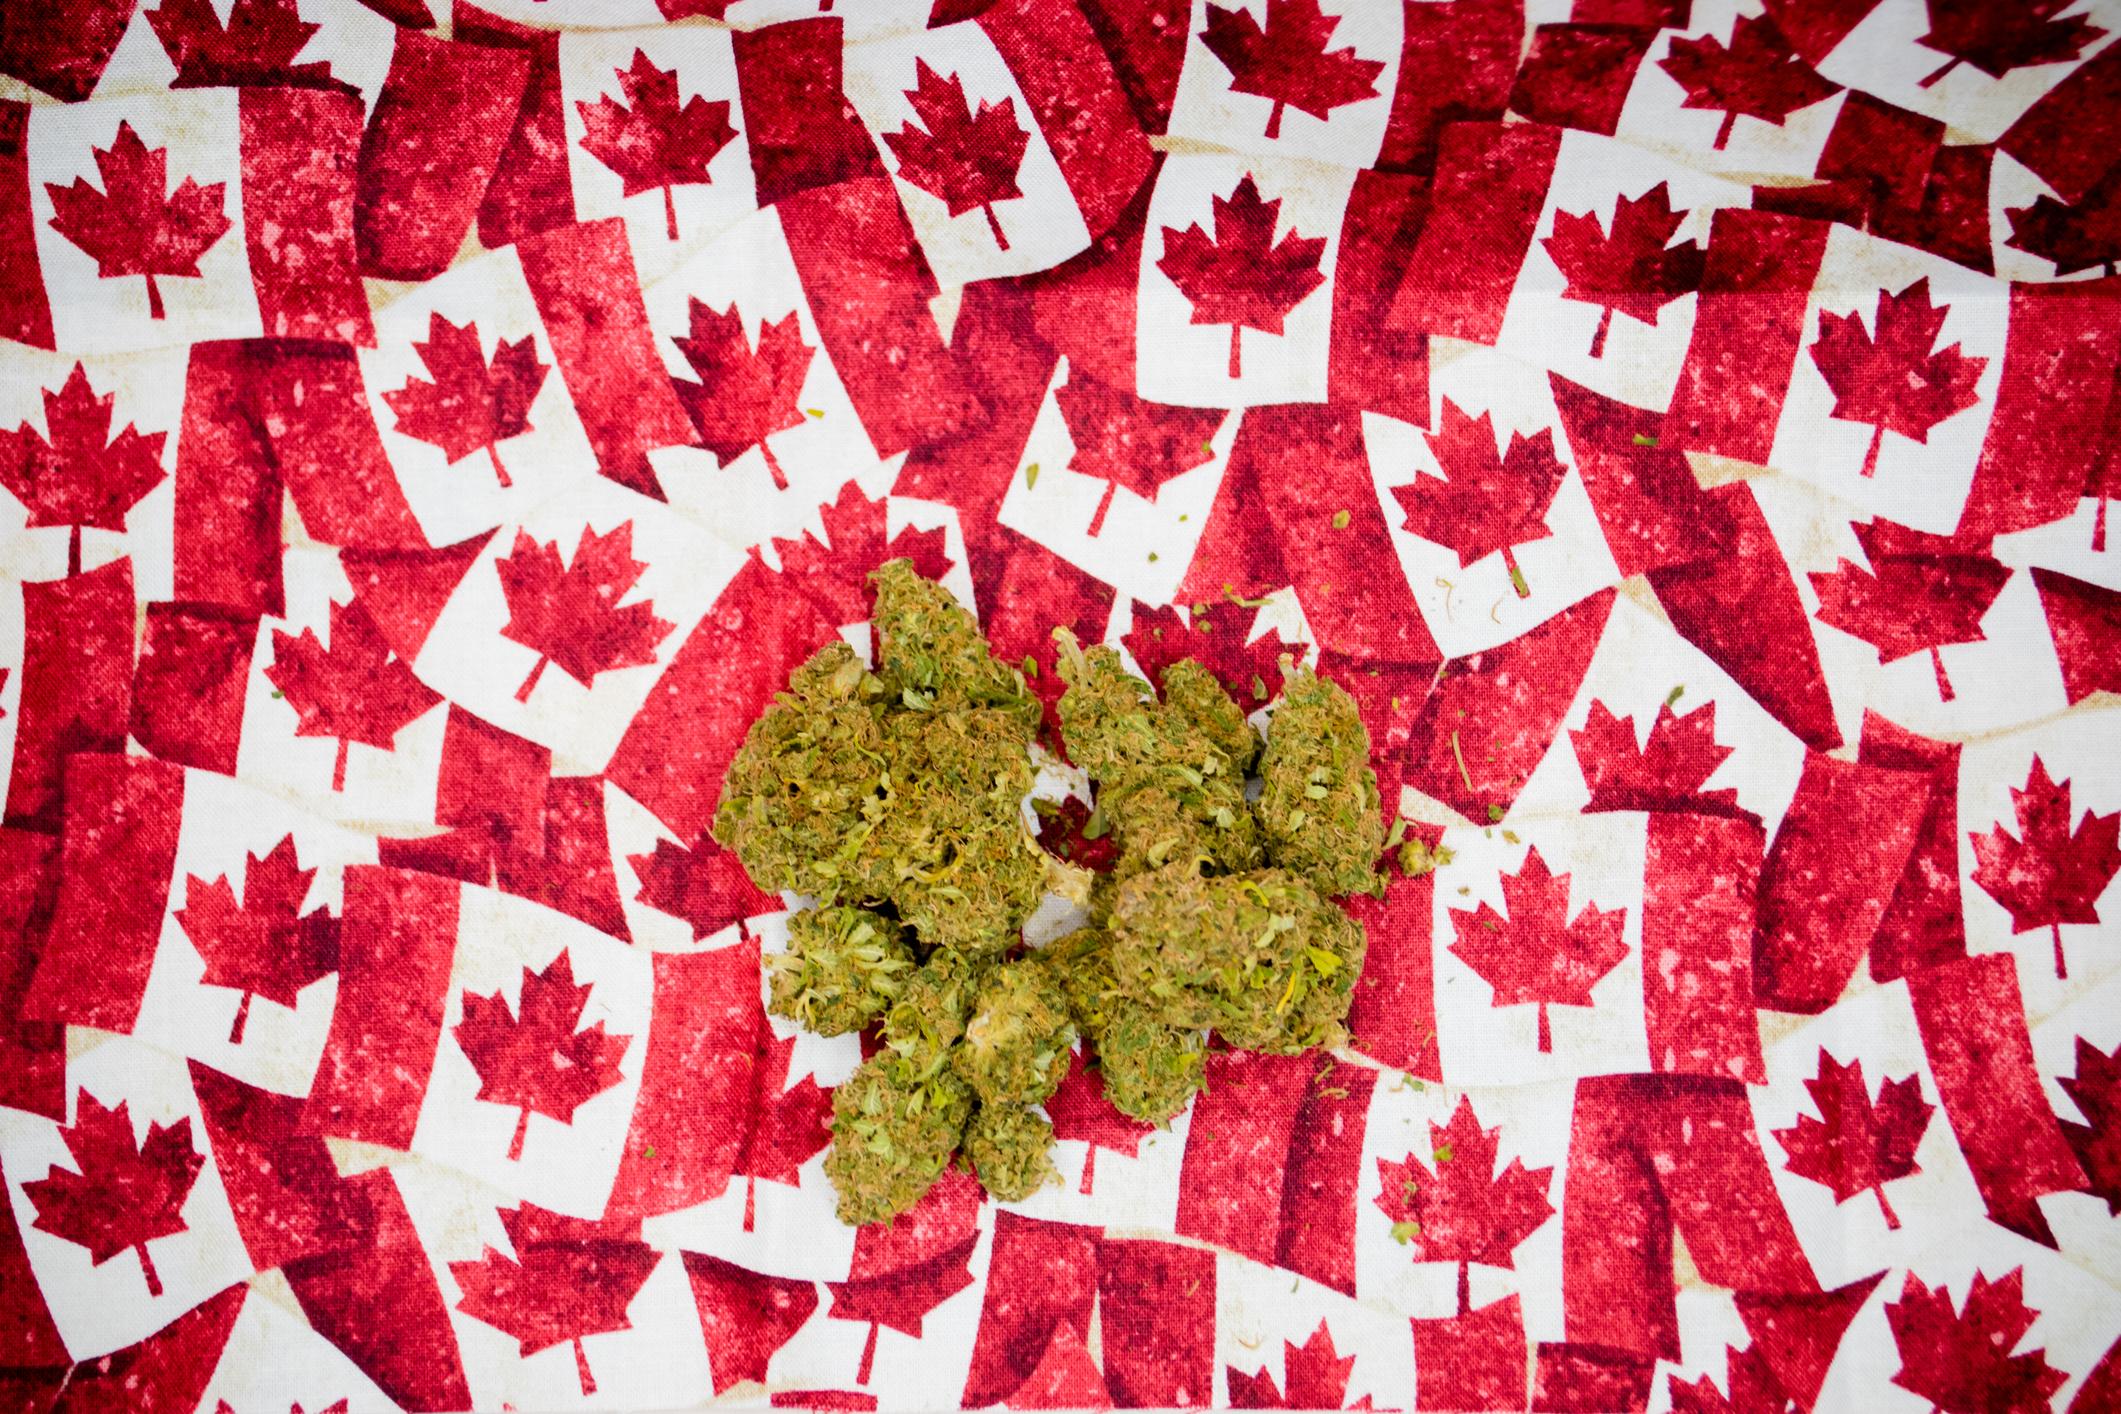 Marijuana buds on top of tiny Canadian flags